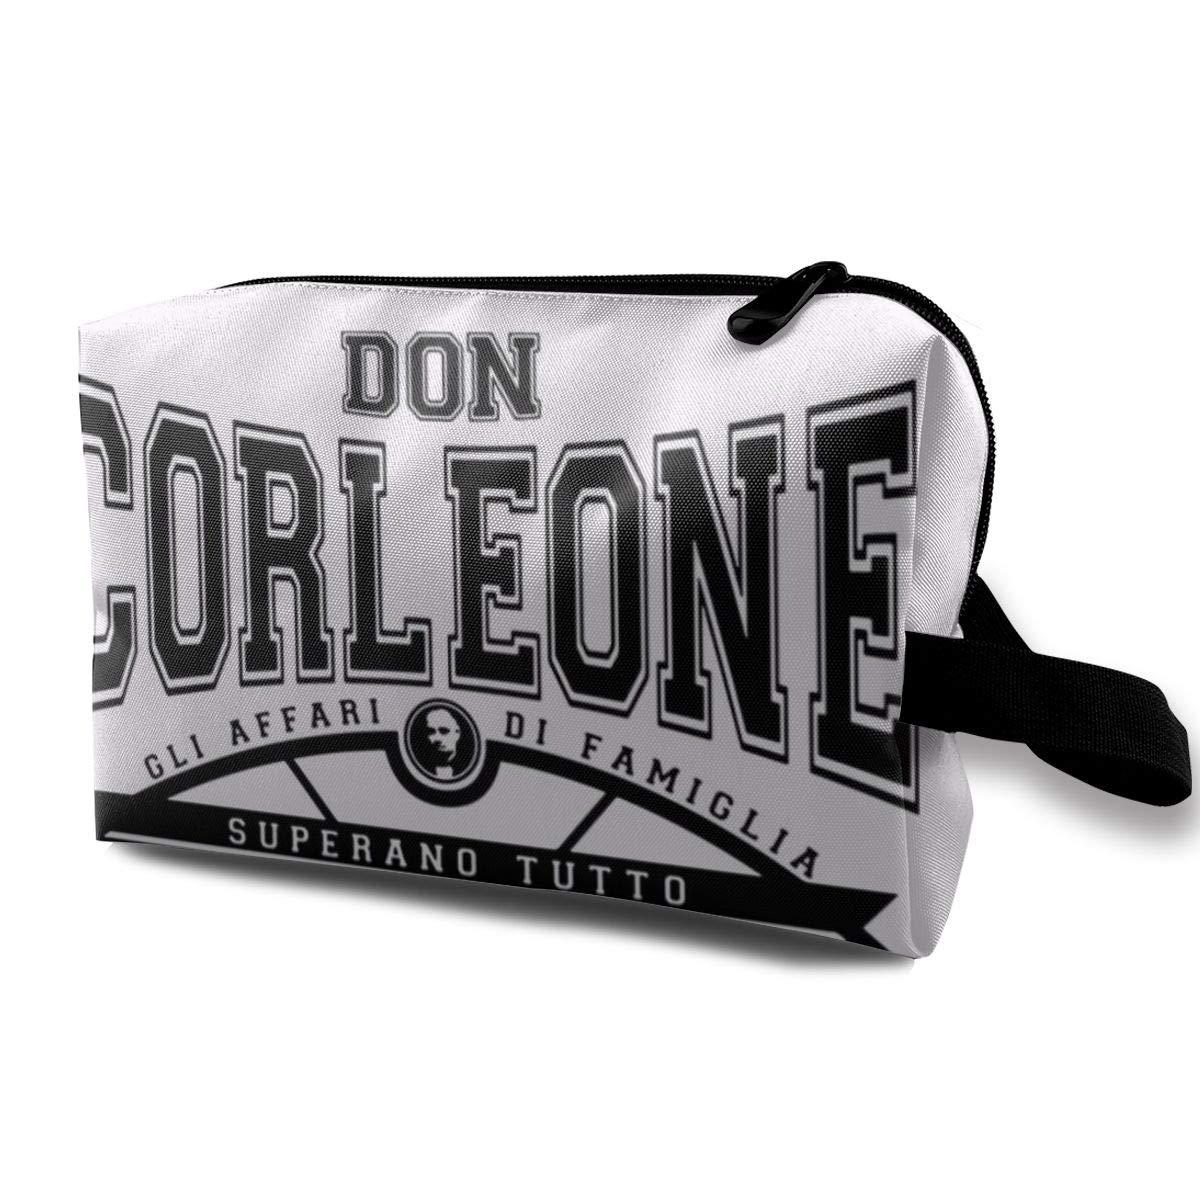 Makeup Bag Cosmetic Pouch Don Corleone Superano Tutto The Godfather, Trucker Cap Whiteblack Multi-Functional Bag Travel Kit Storage Bag